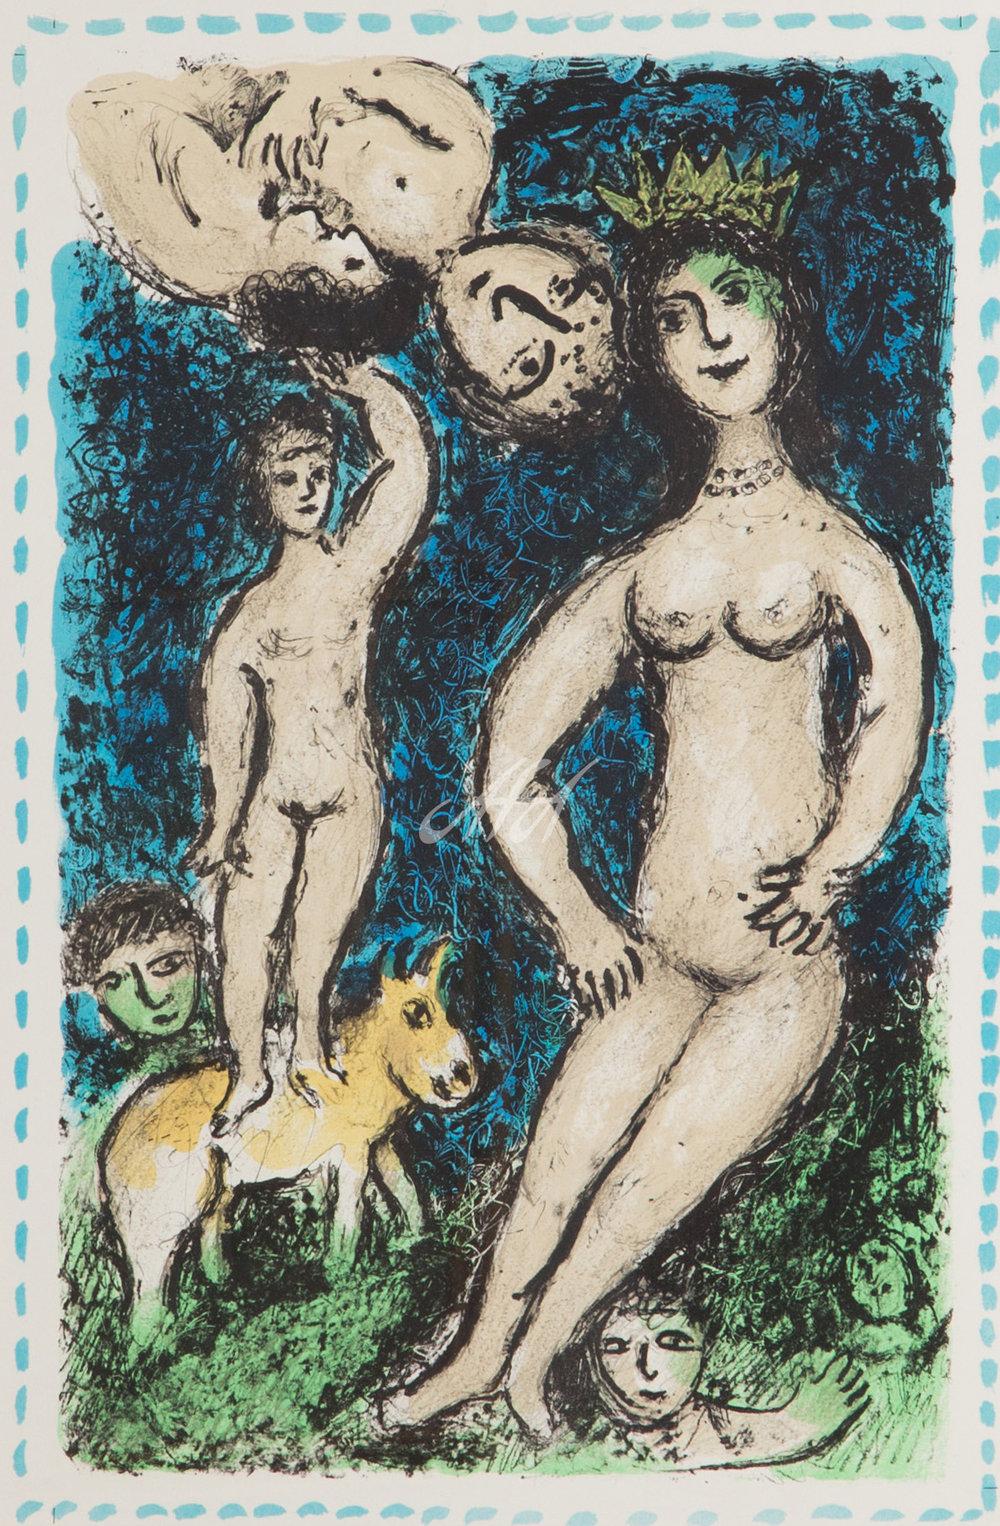 Marc_Chagall_figurative4 LoRes watermark.jpg